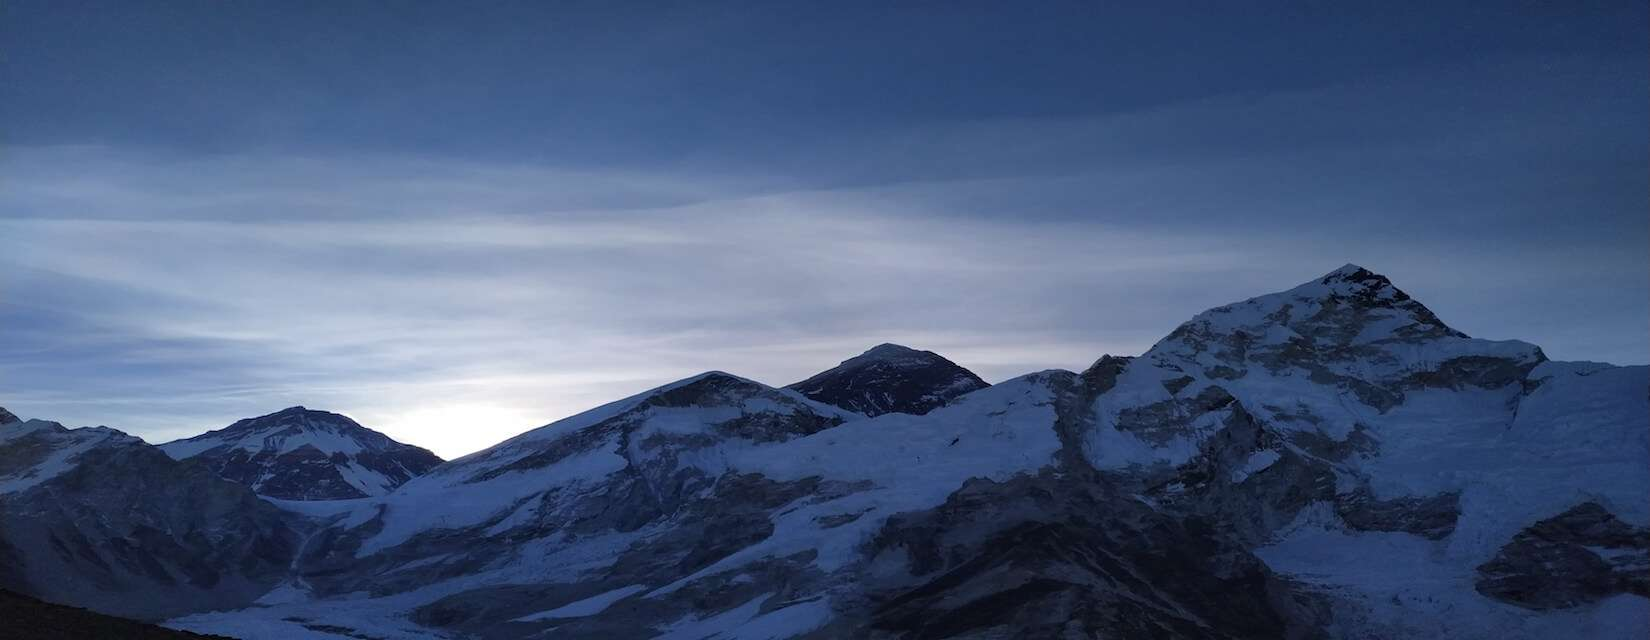 Nepal Visa Information - Himalayan frozen adventure